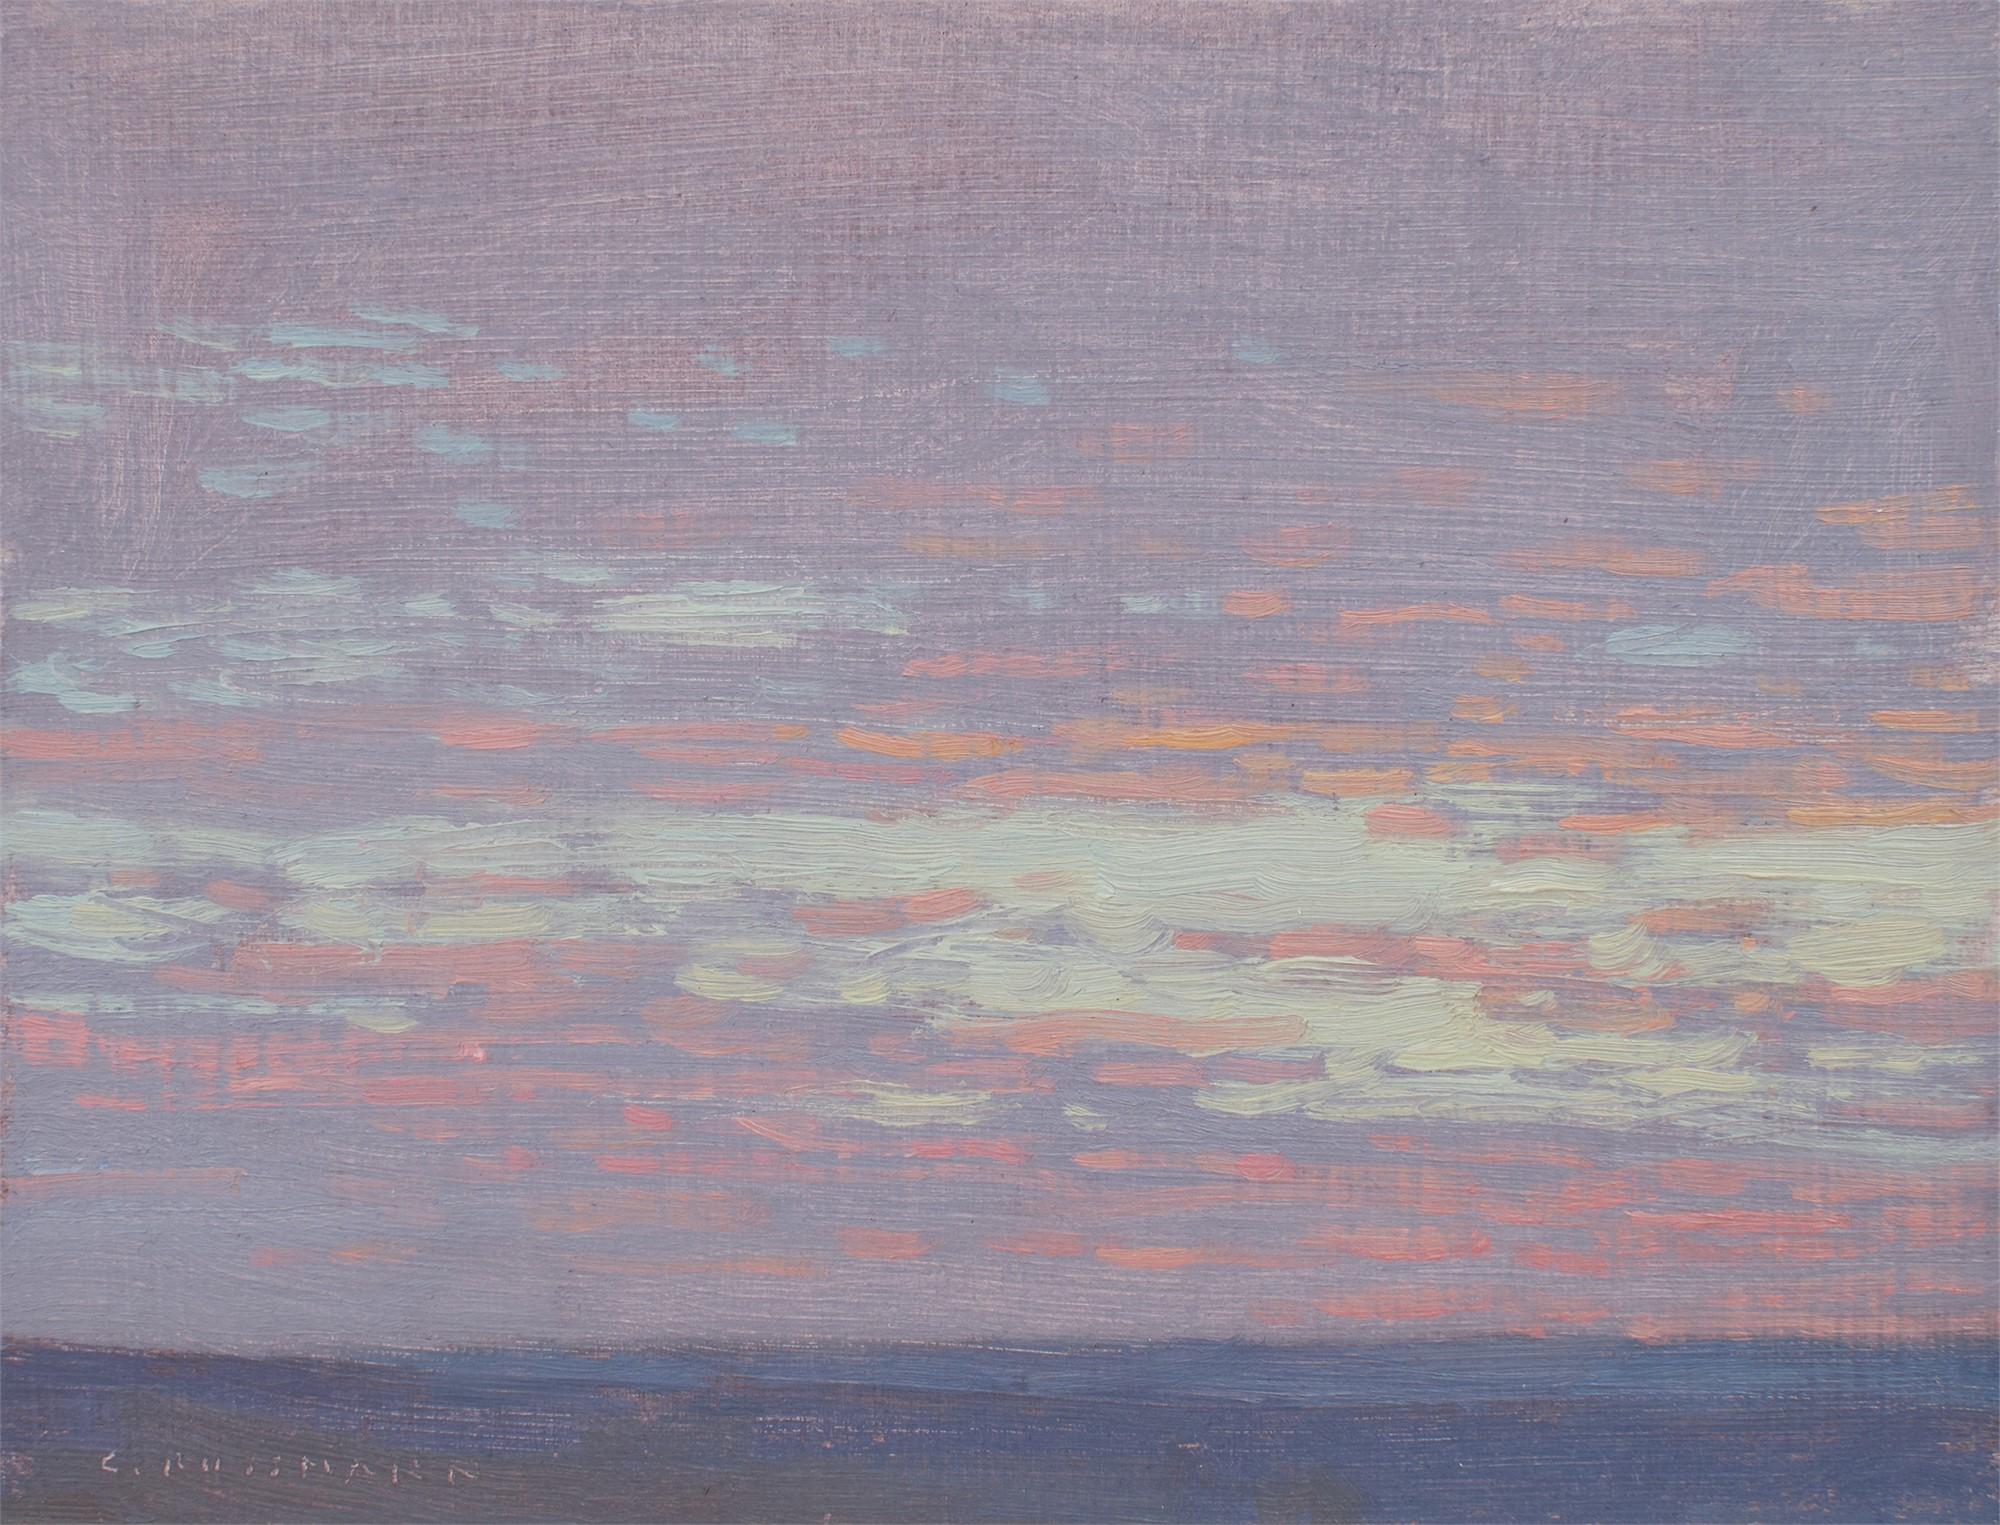 Winter Solstice Dawn by David Grossmann